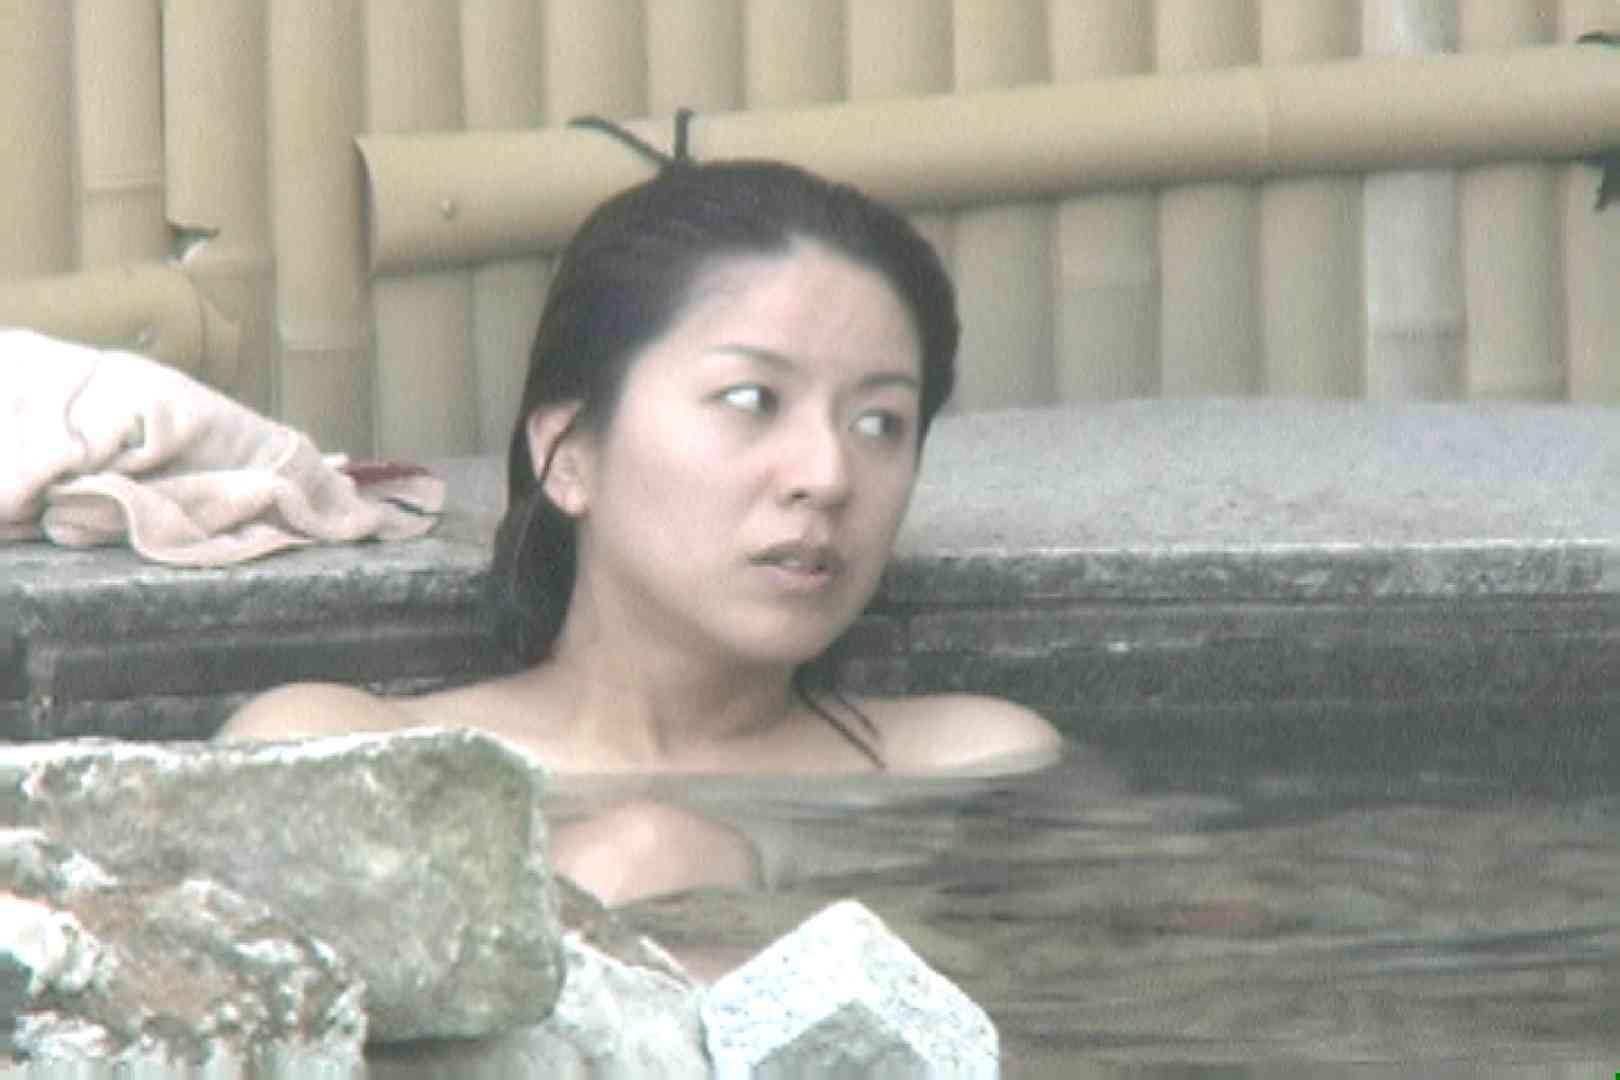 Aquaな露天風呂Vol.694 露天風呂編 | 盗撮シリーズ  83PIX 79